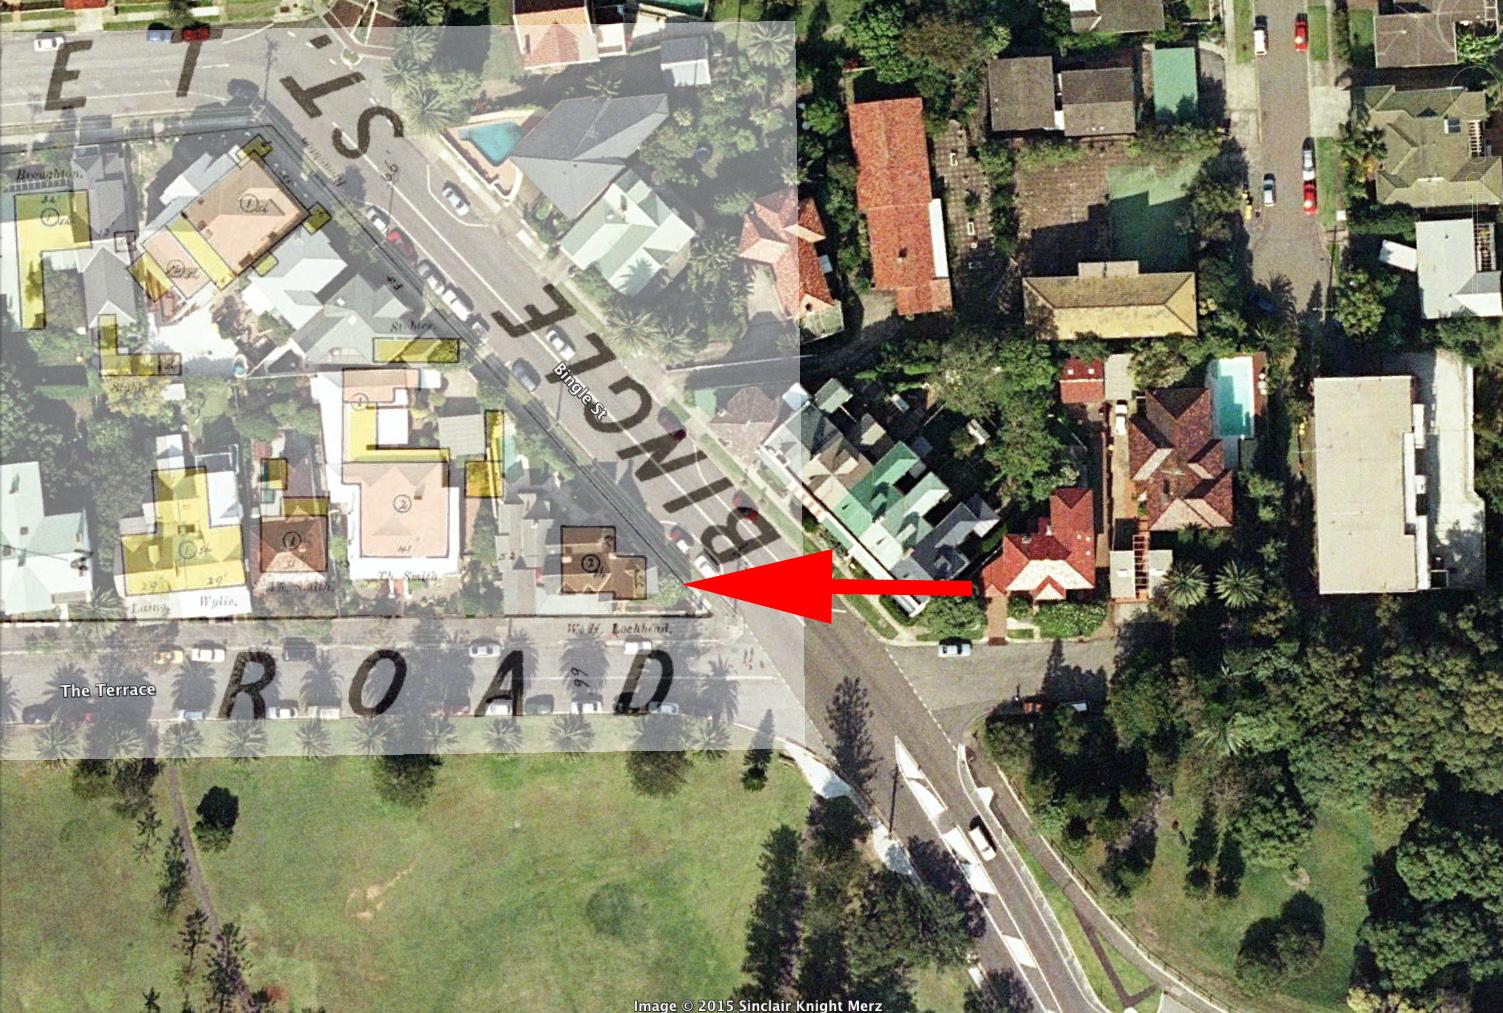 Property of W.K. Lochhead at corner of Bingle Street and Terrace Road, 1886 overlay by Gionni Di Gravio (2014)